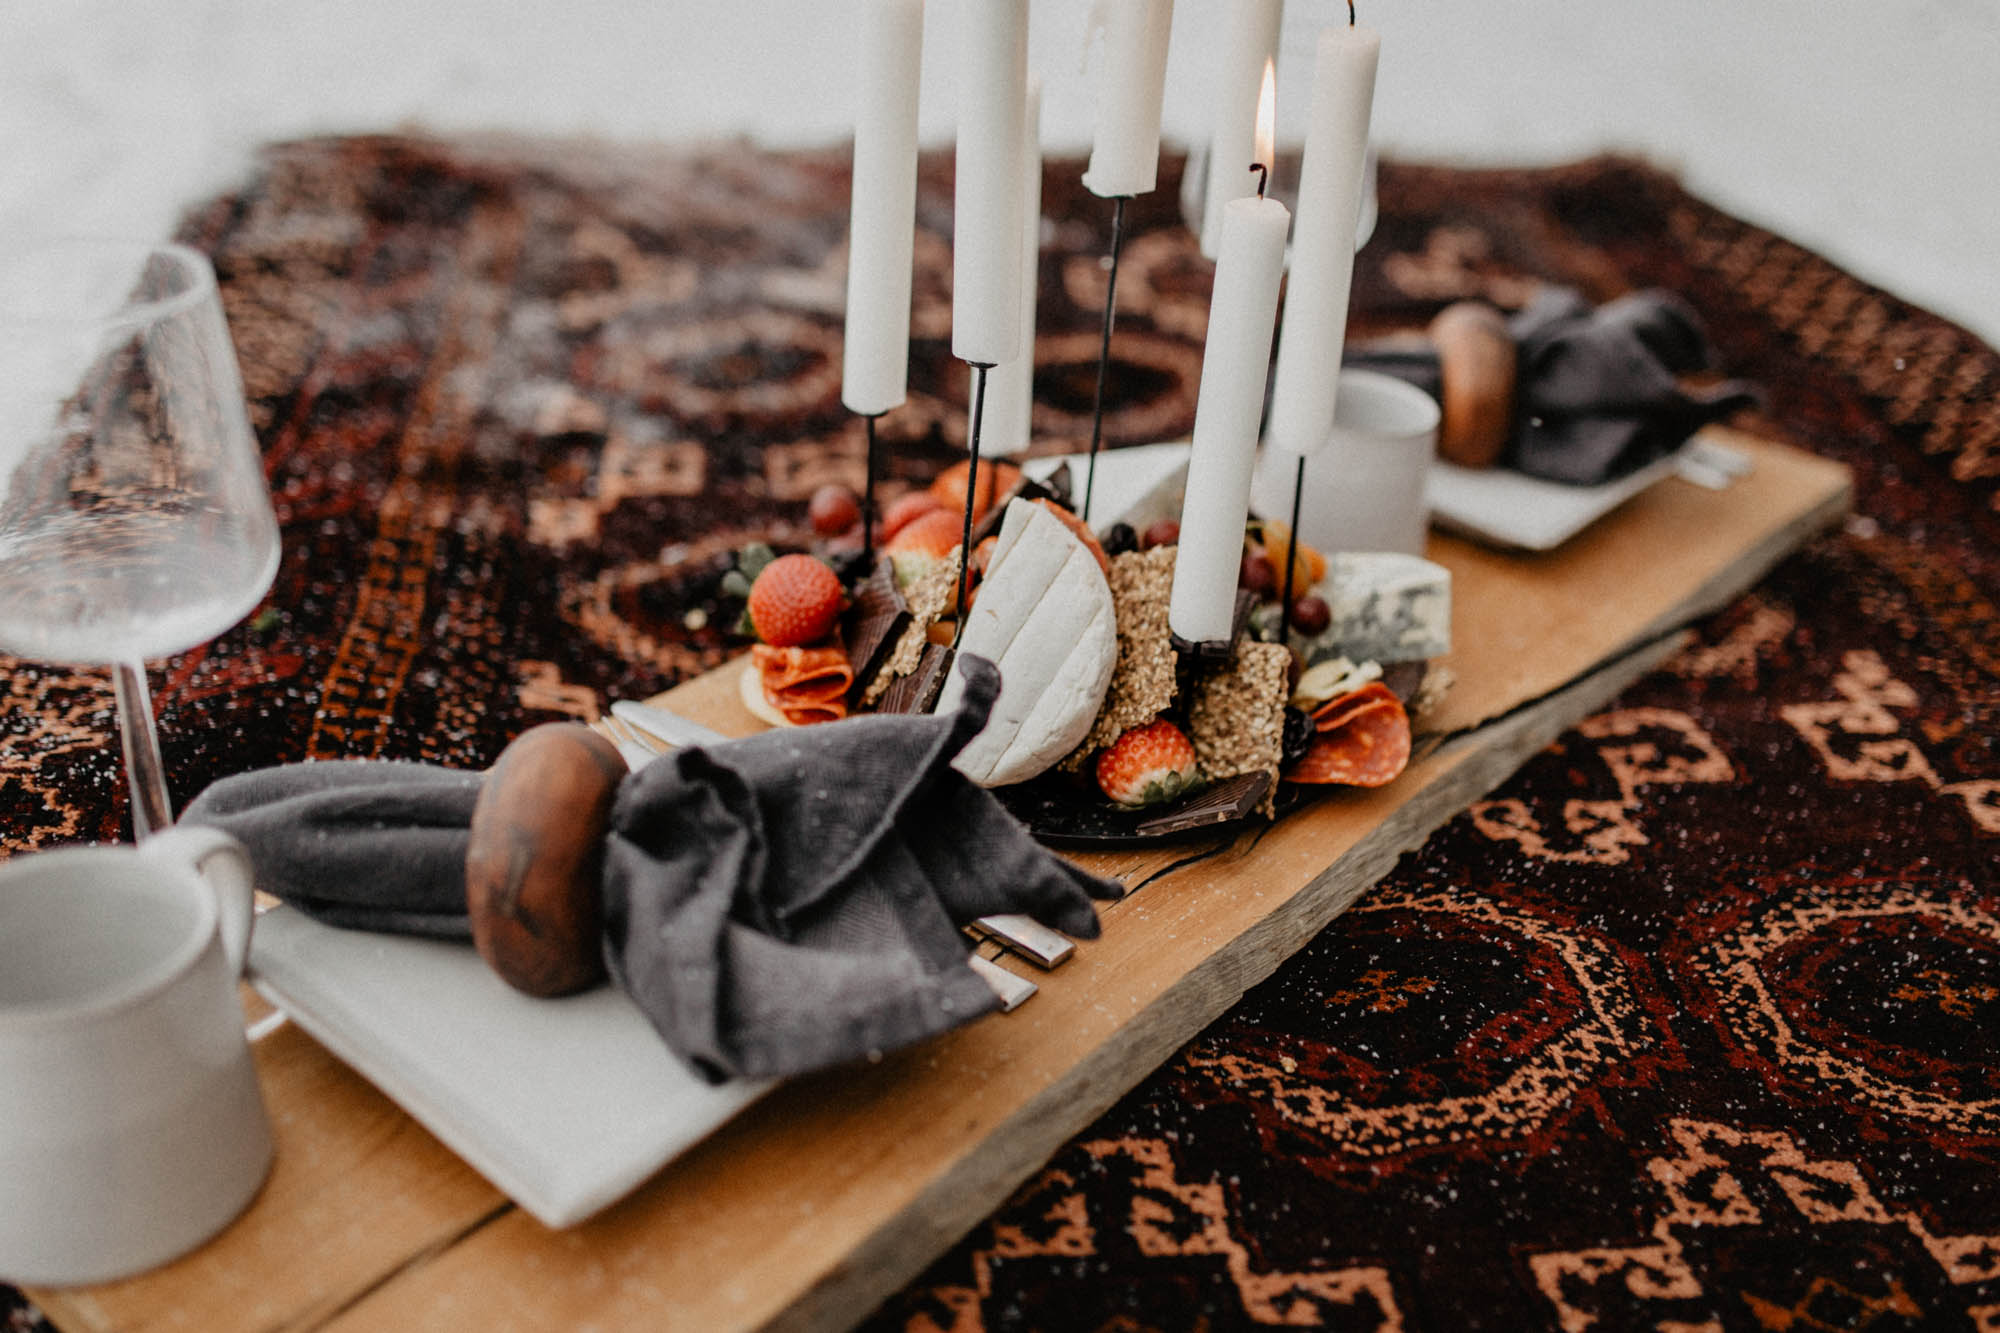 ashley_schulman_photography-winter_wedding_tampere-46.jpg